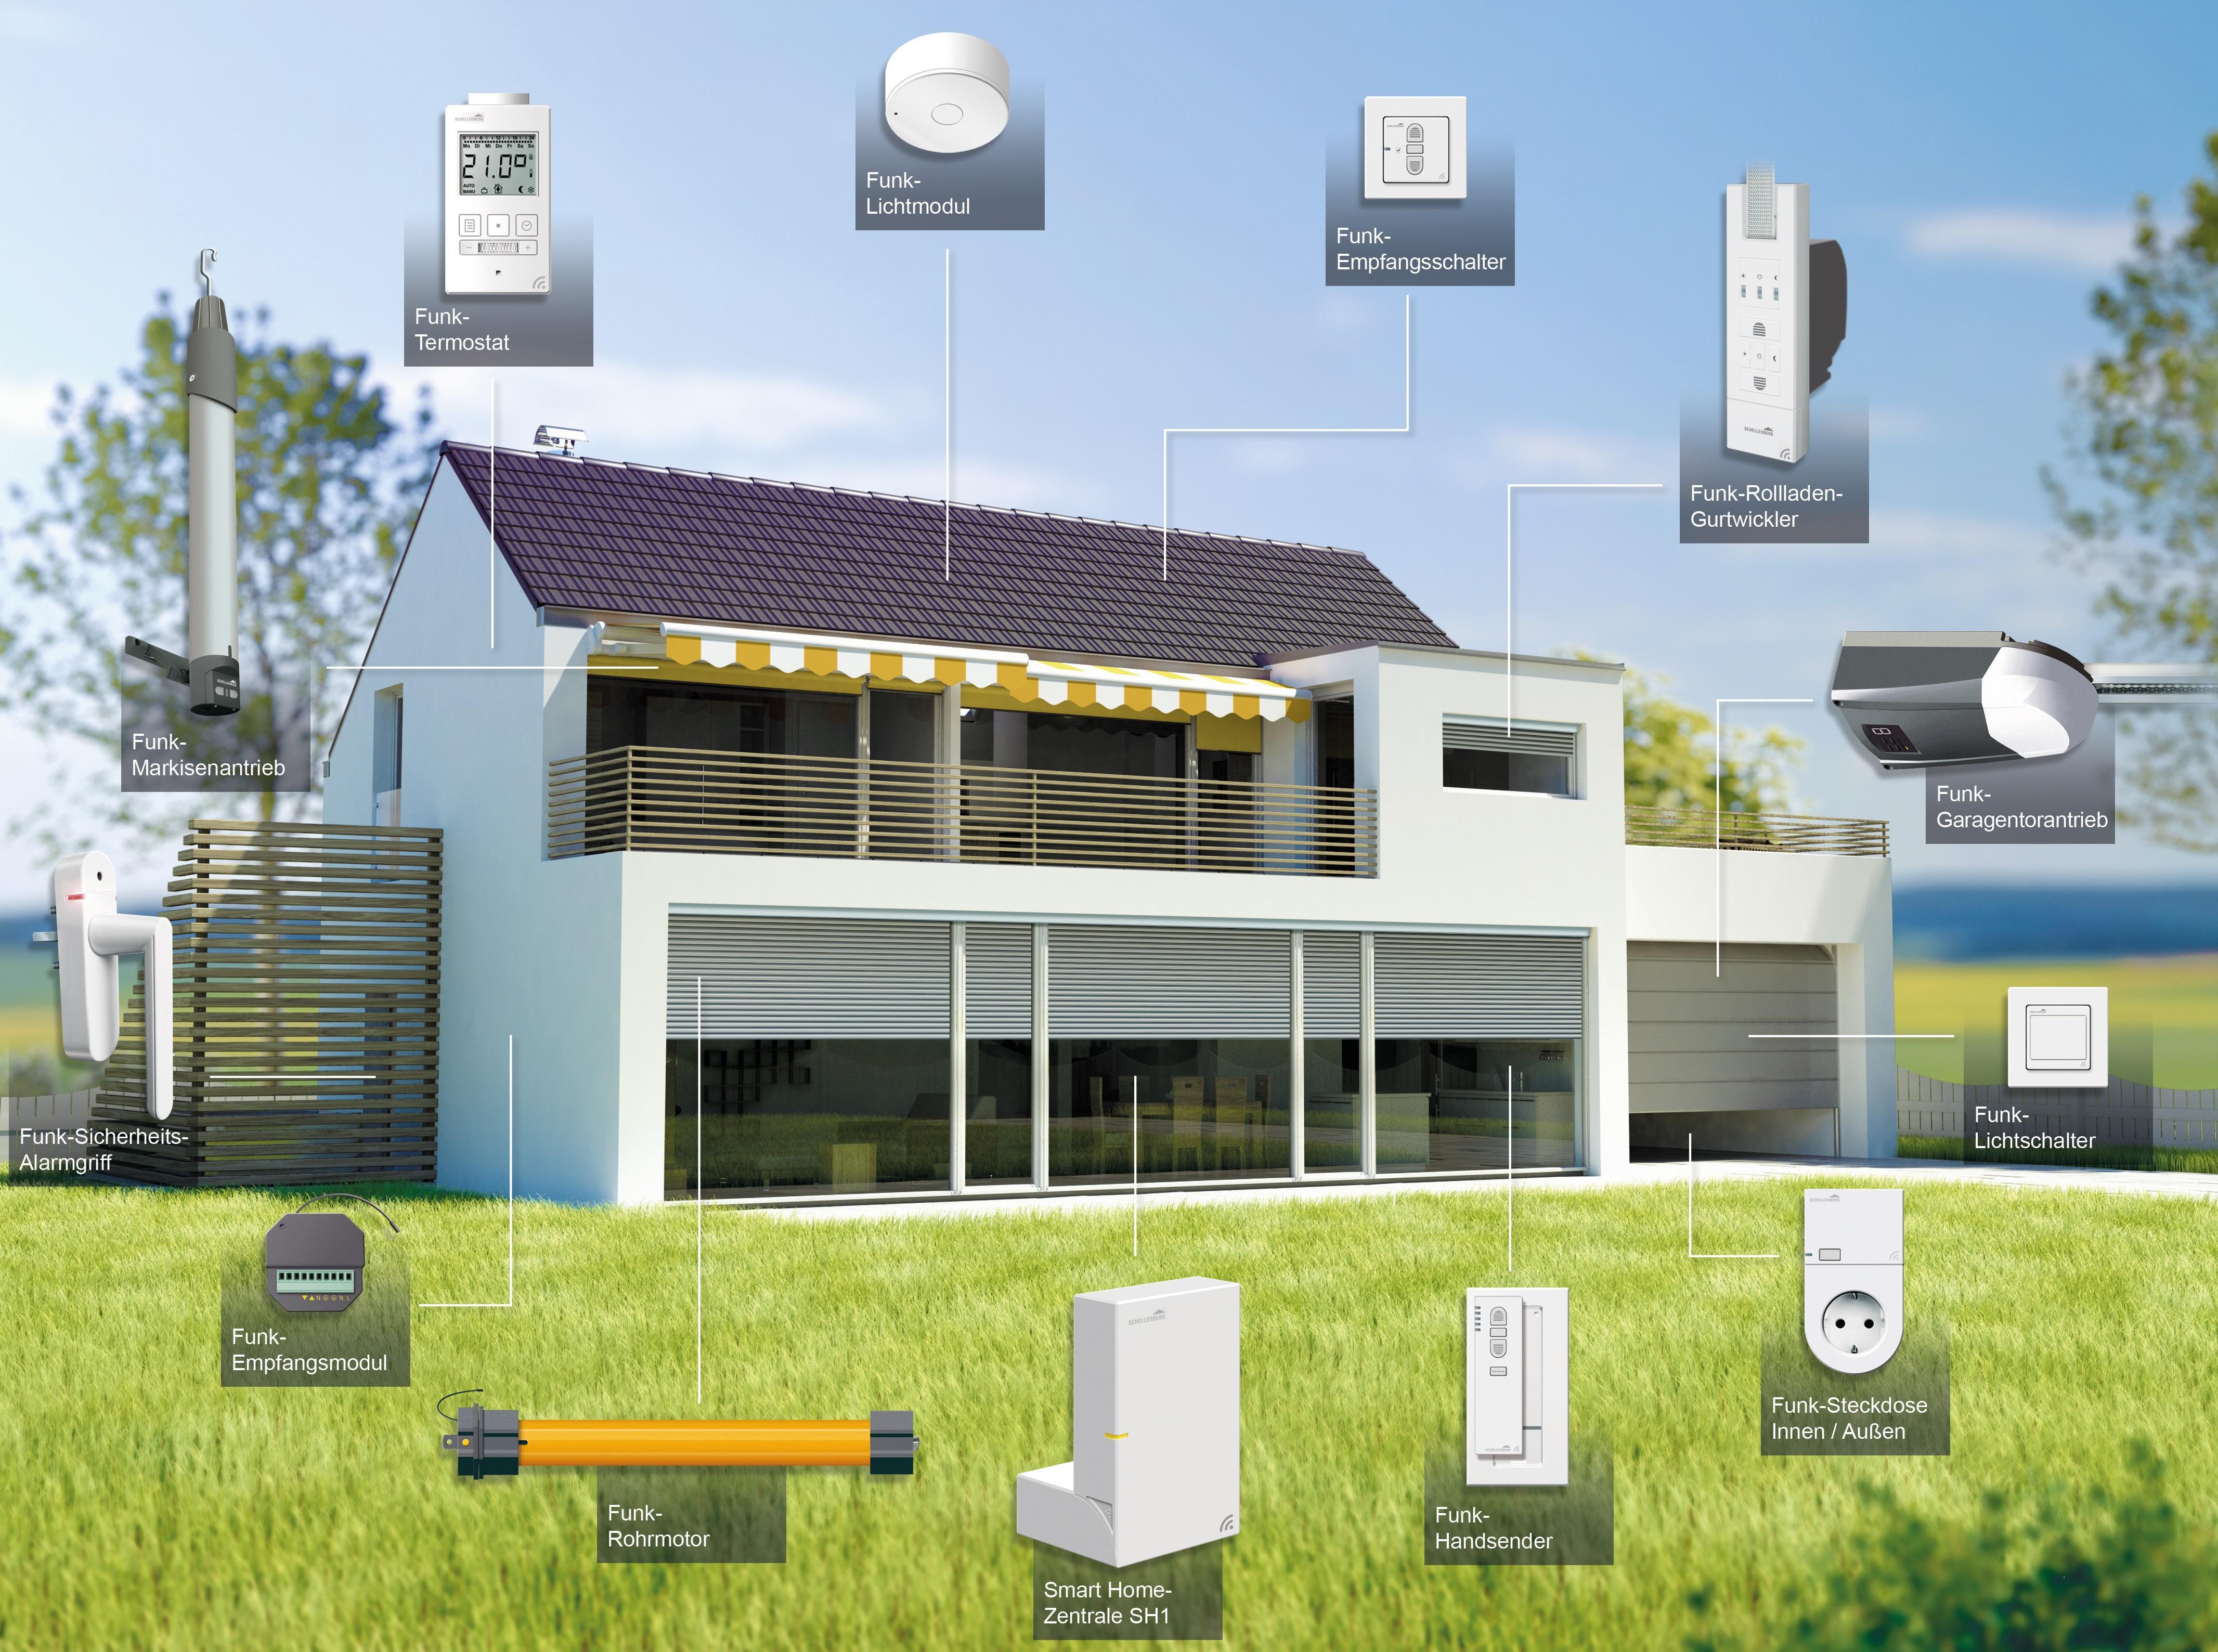 schellenberg smart home zentrale sh1 datensichere haussteuerung smart home gateway zur. Black Bedroom Furniture Sets. Home Design Ideas